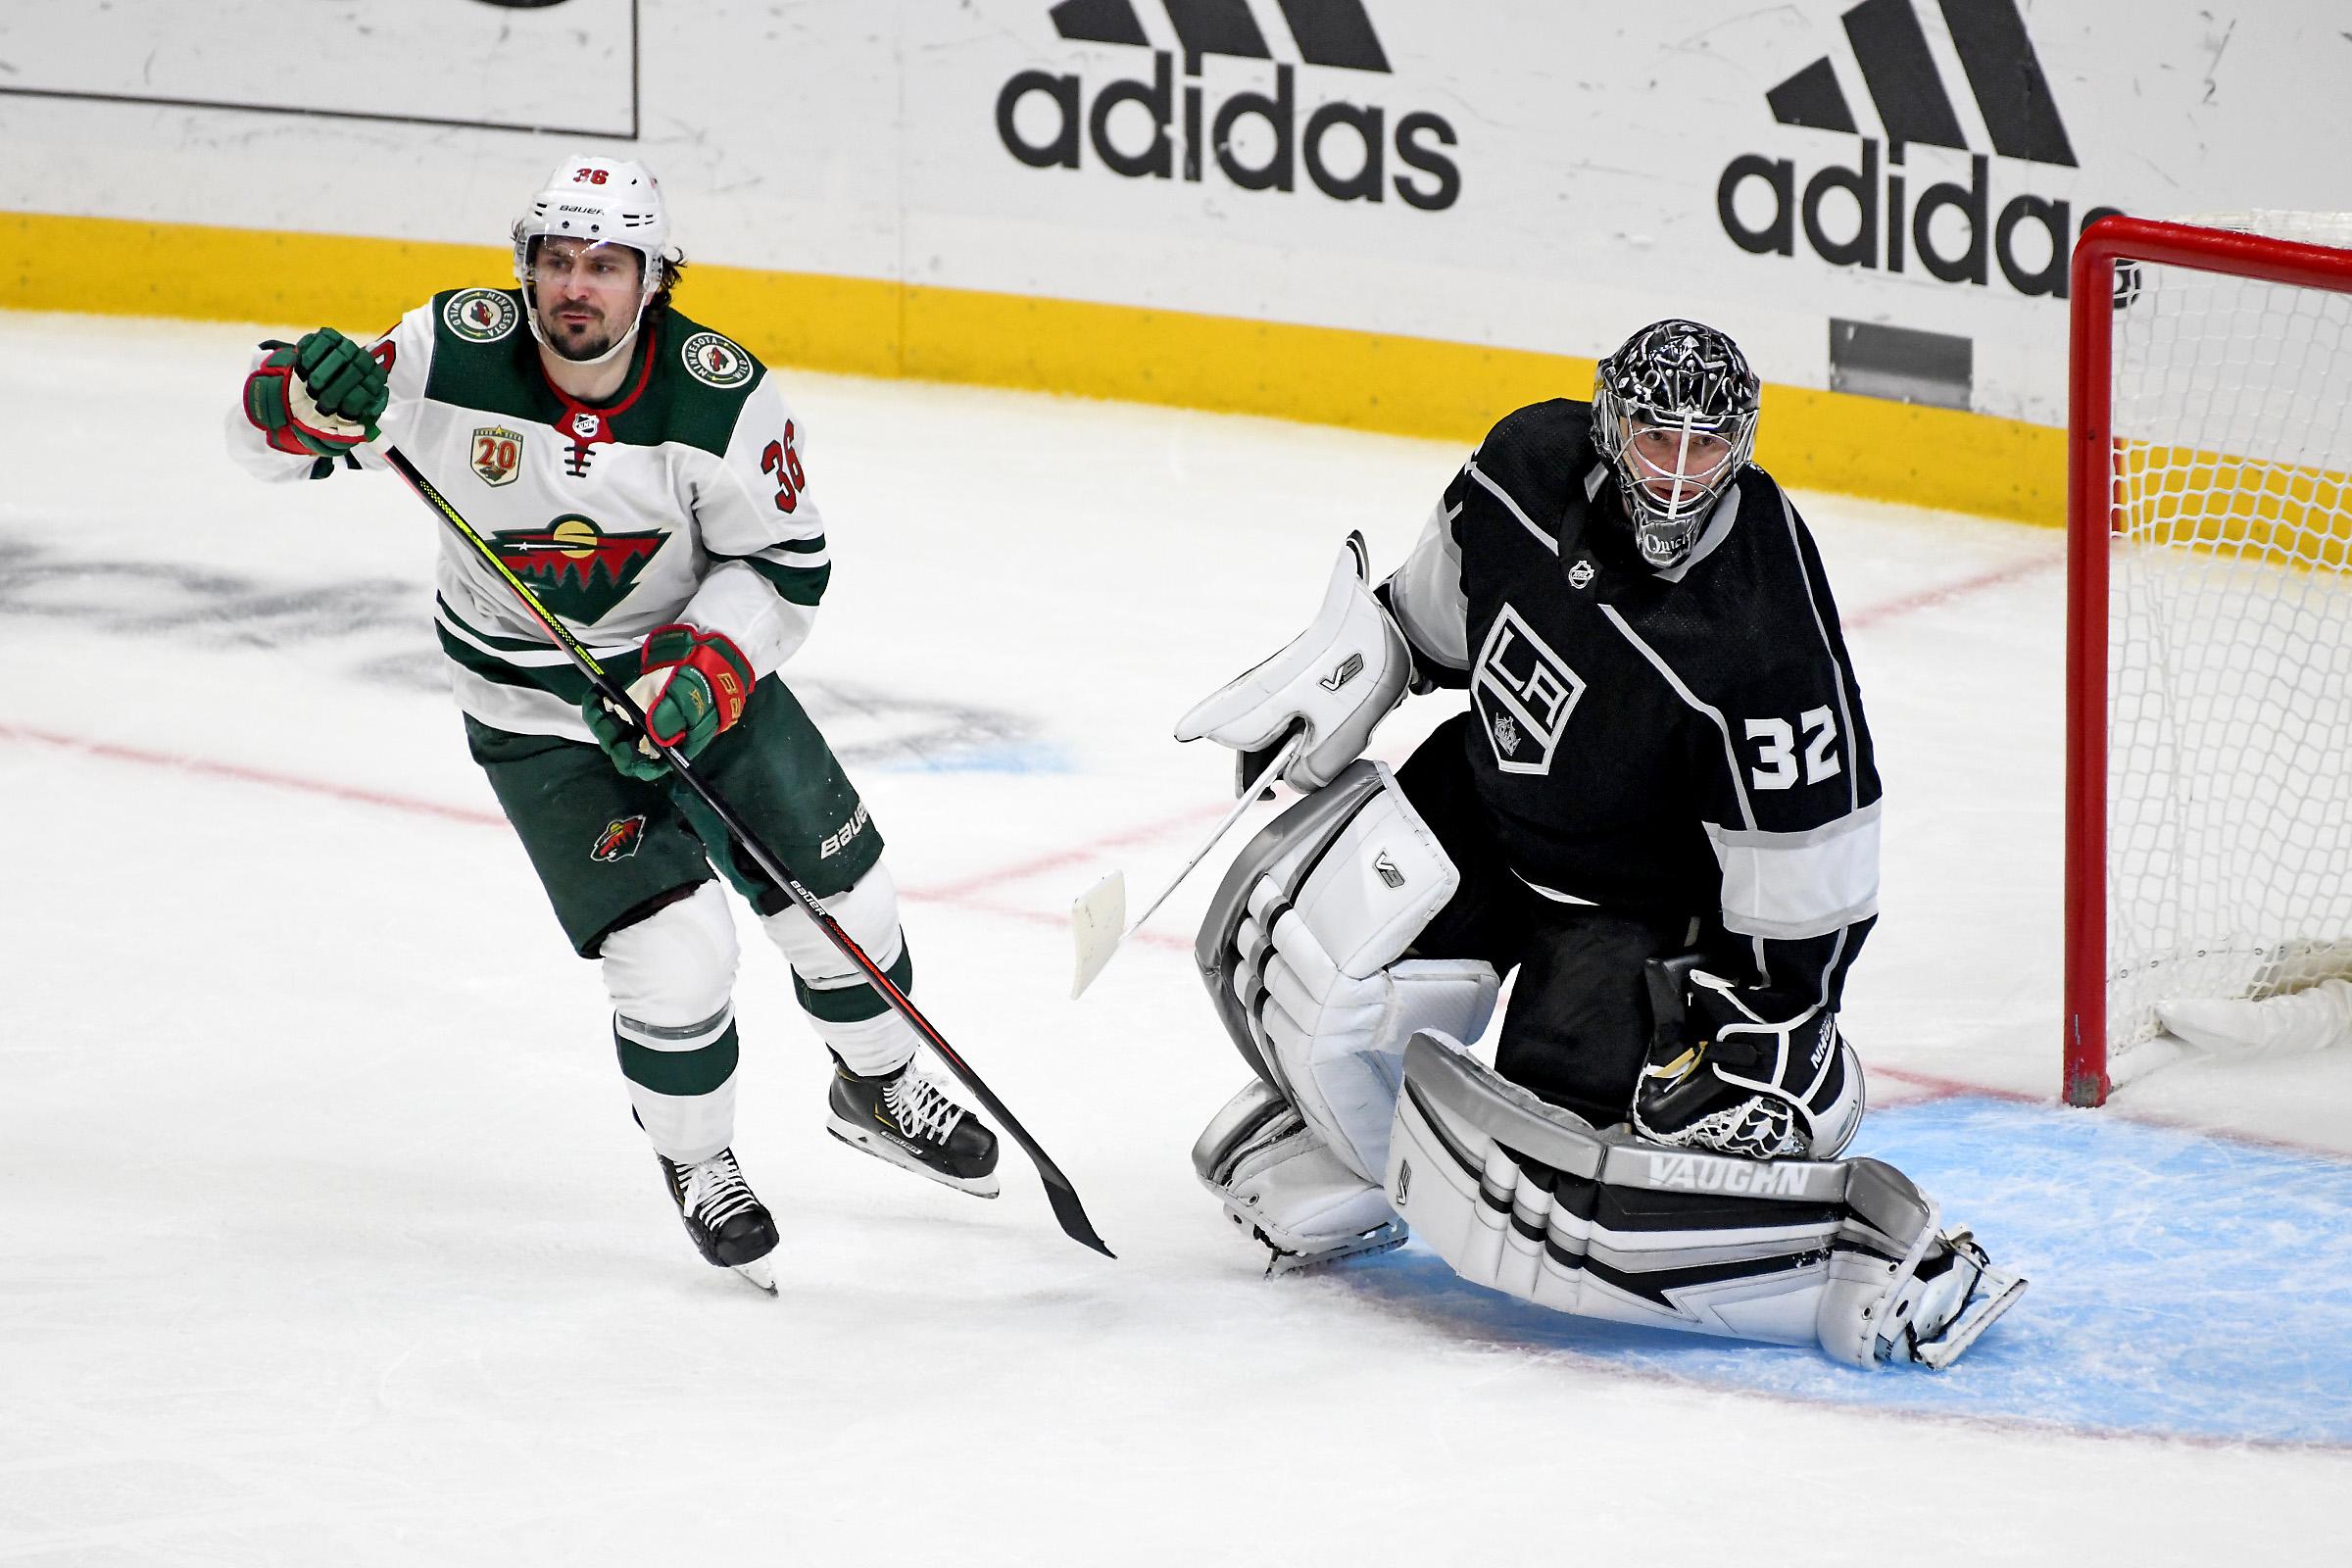 NHL: FEB 16 Wild at Kings